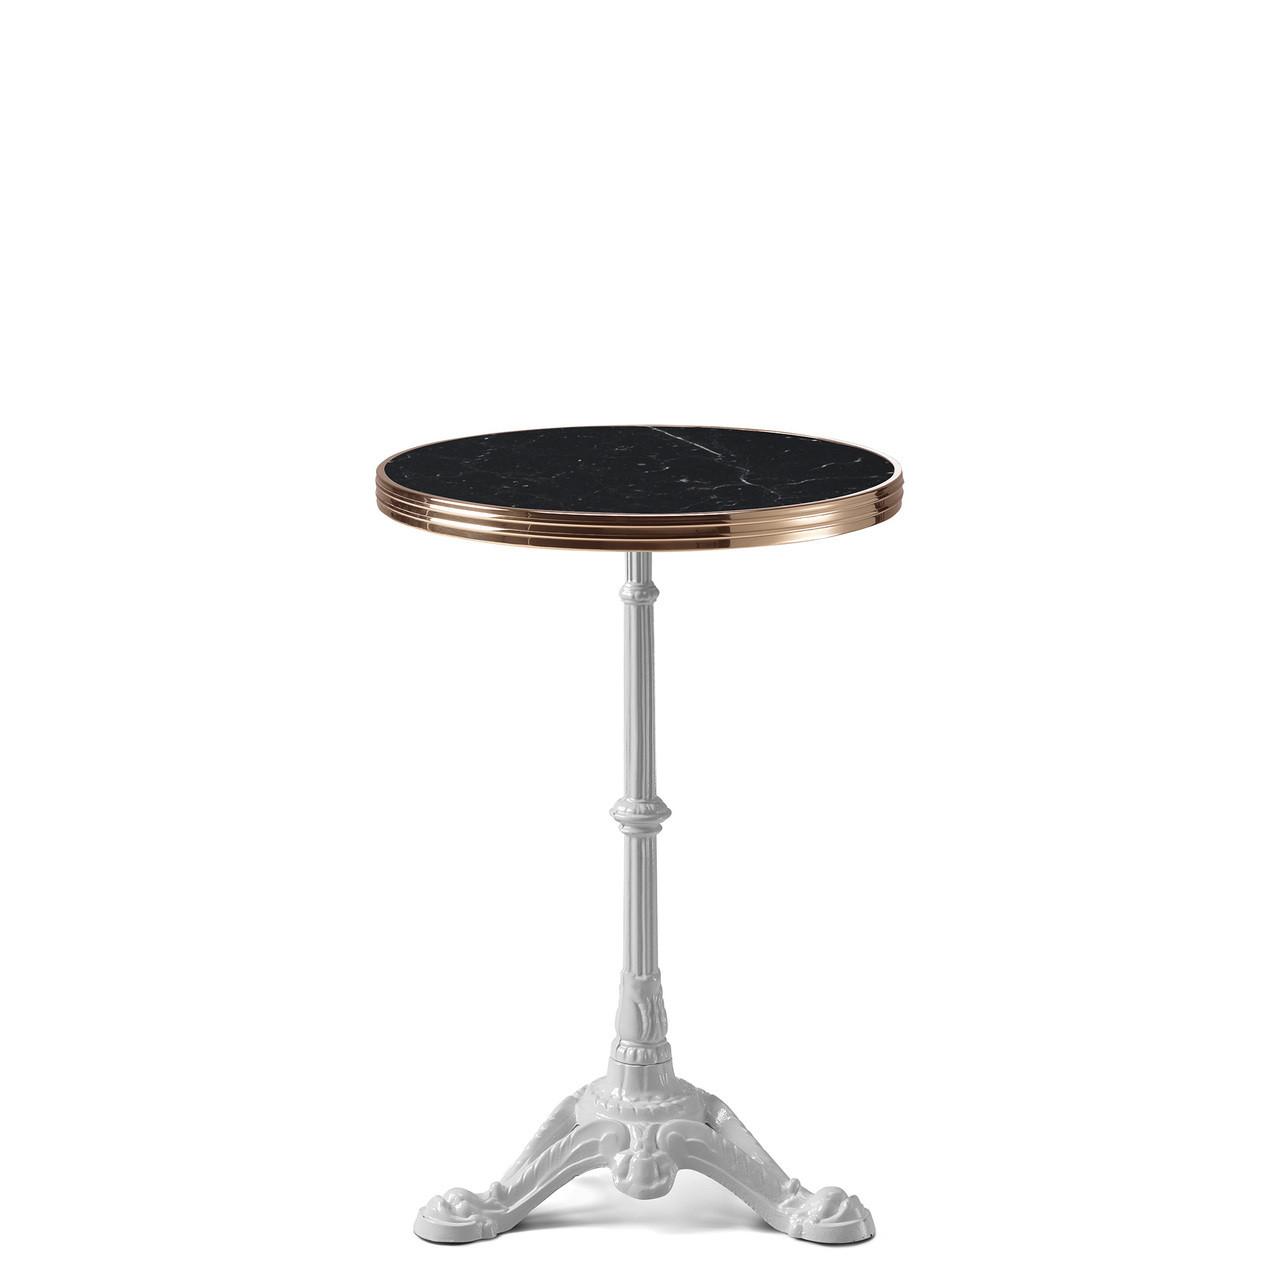 l w round pd treasures in x shop bistro pelham steel garden table bay